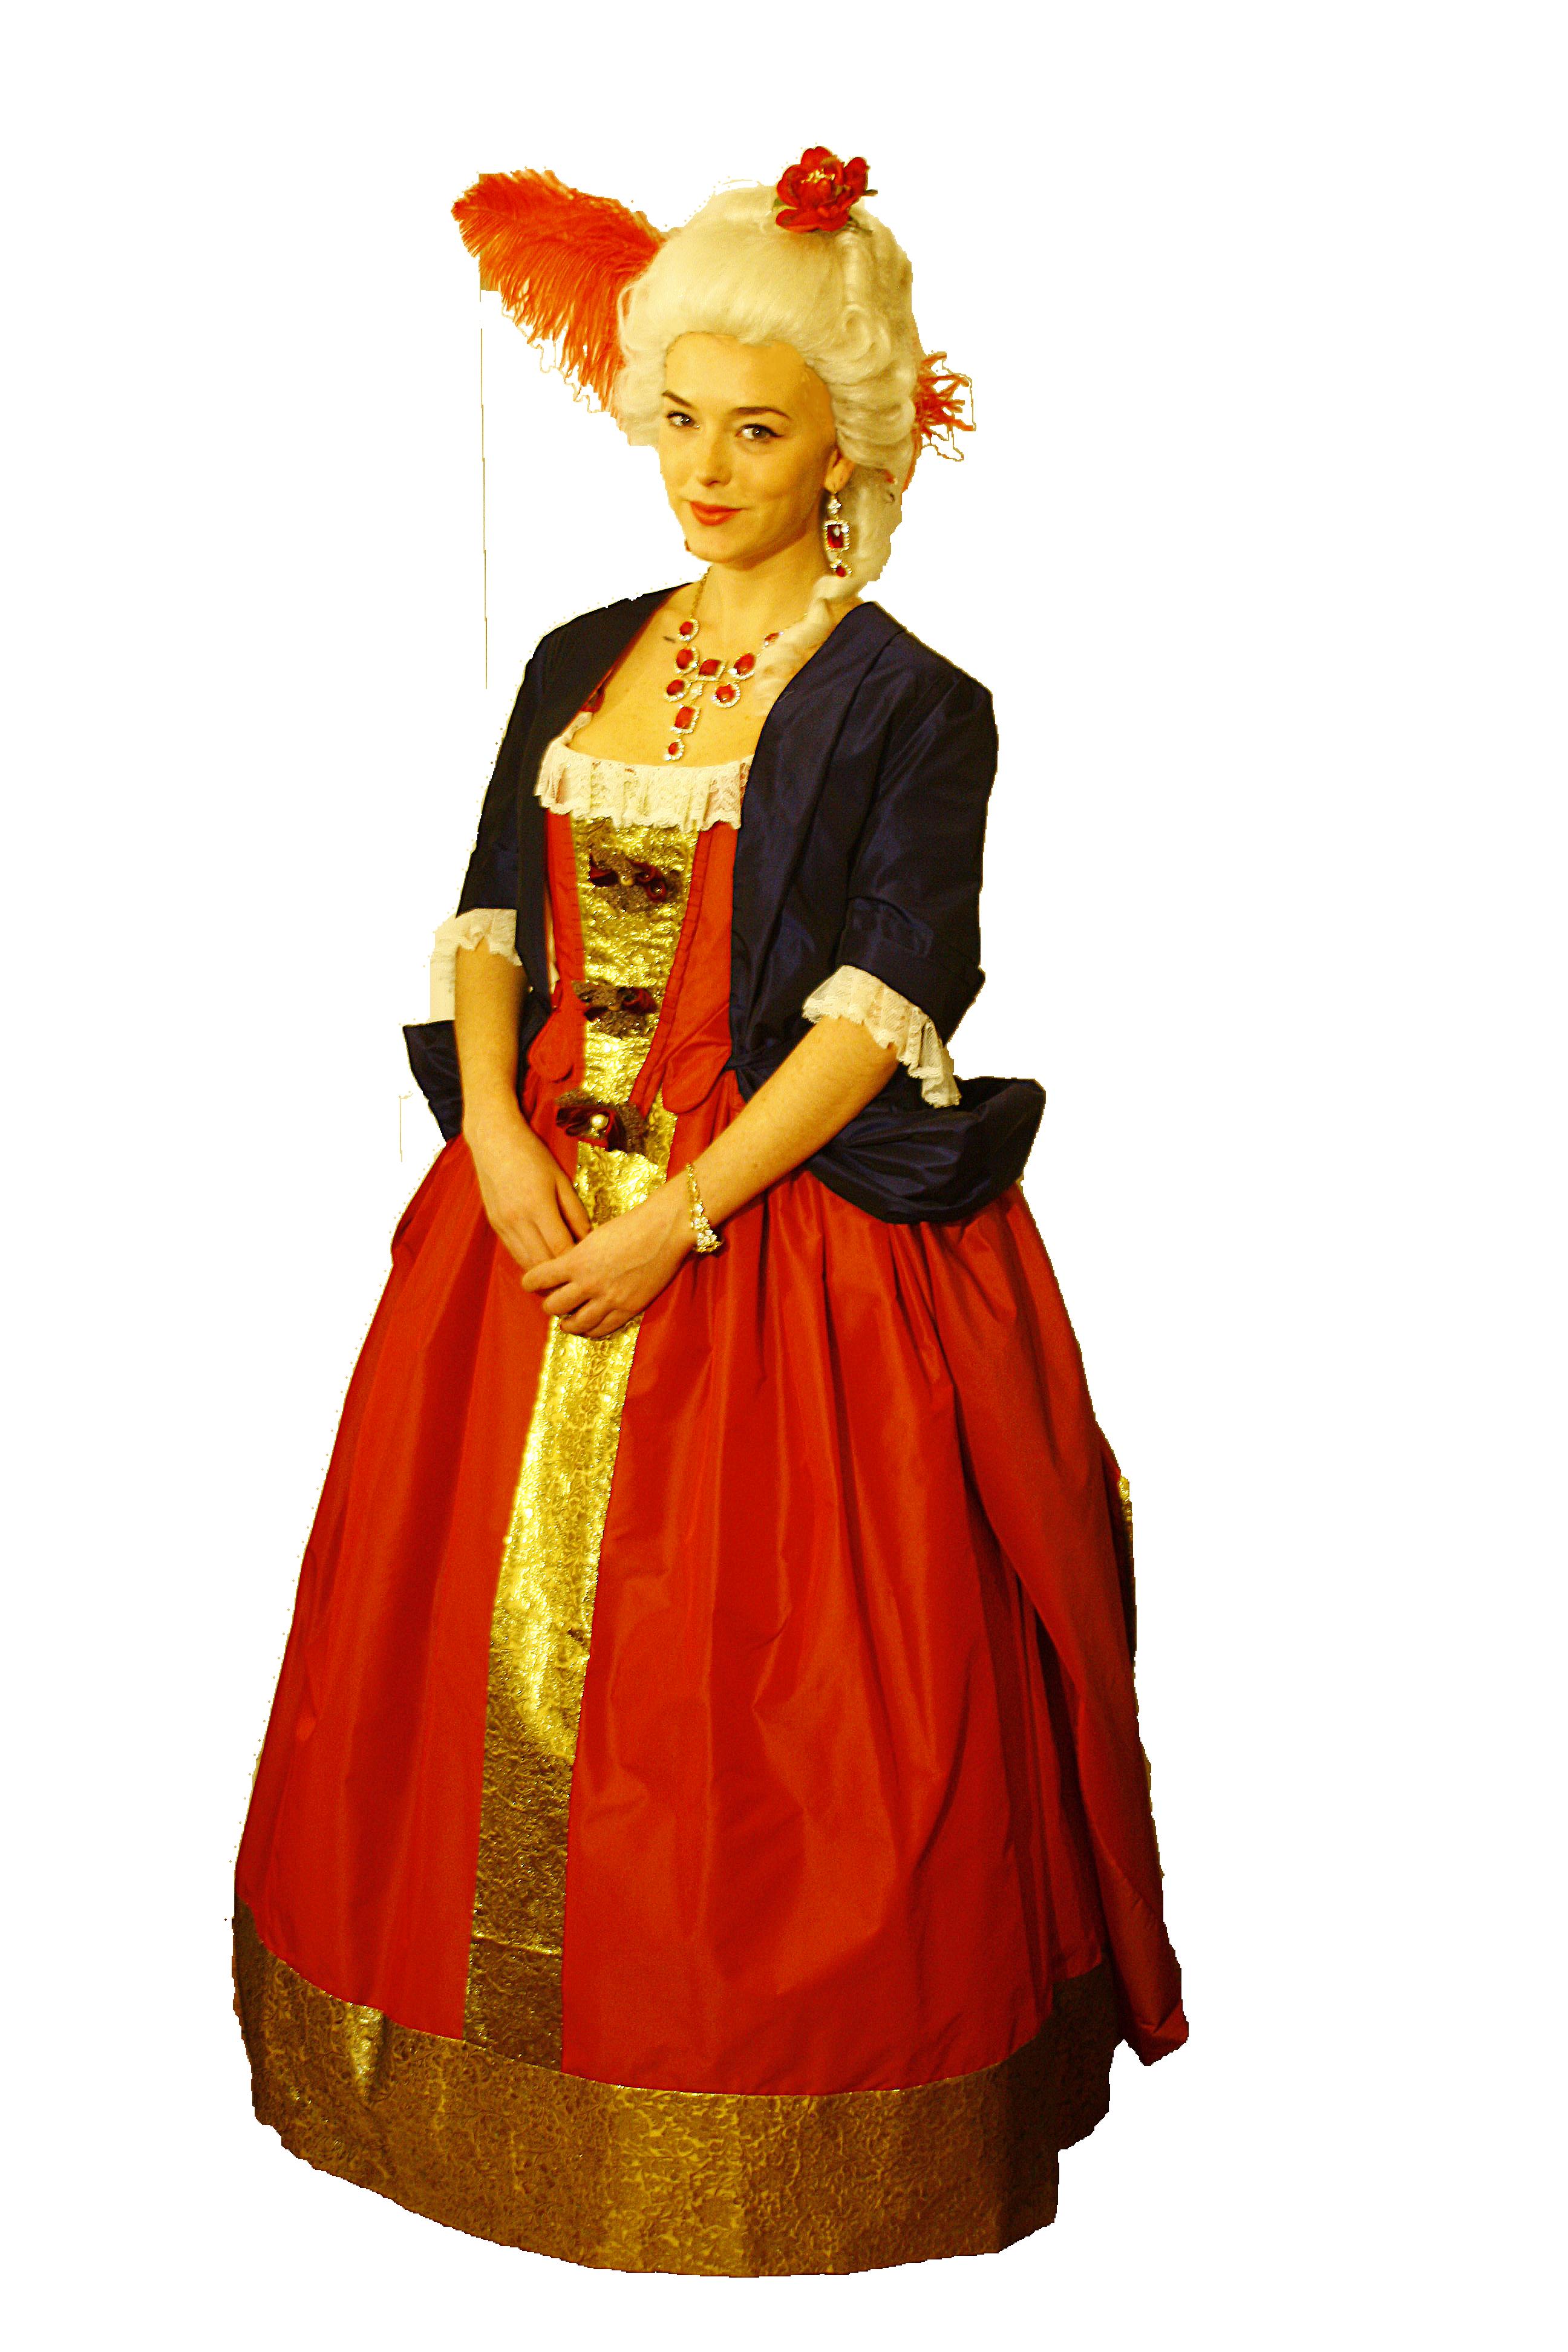 Cabaret Baroque - Marquise du 17e siècle